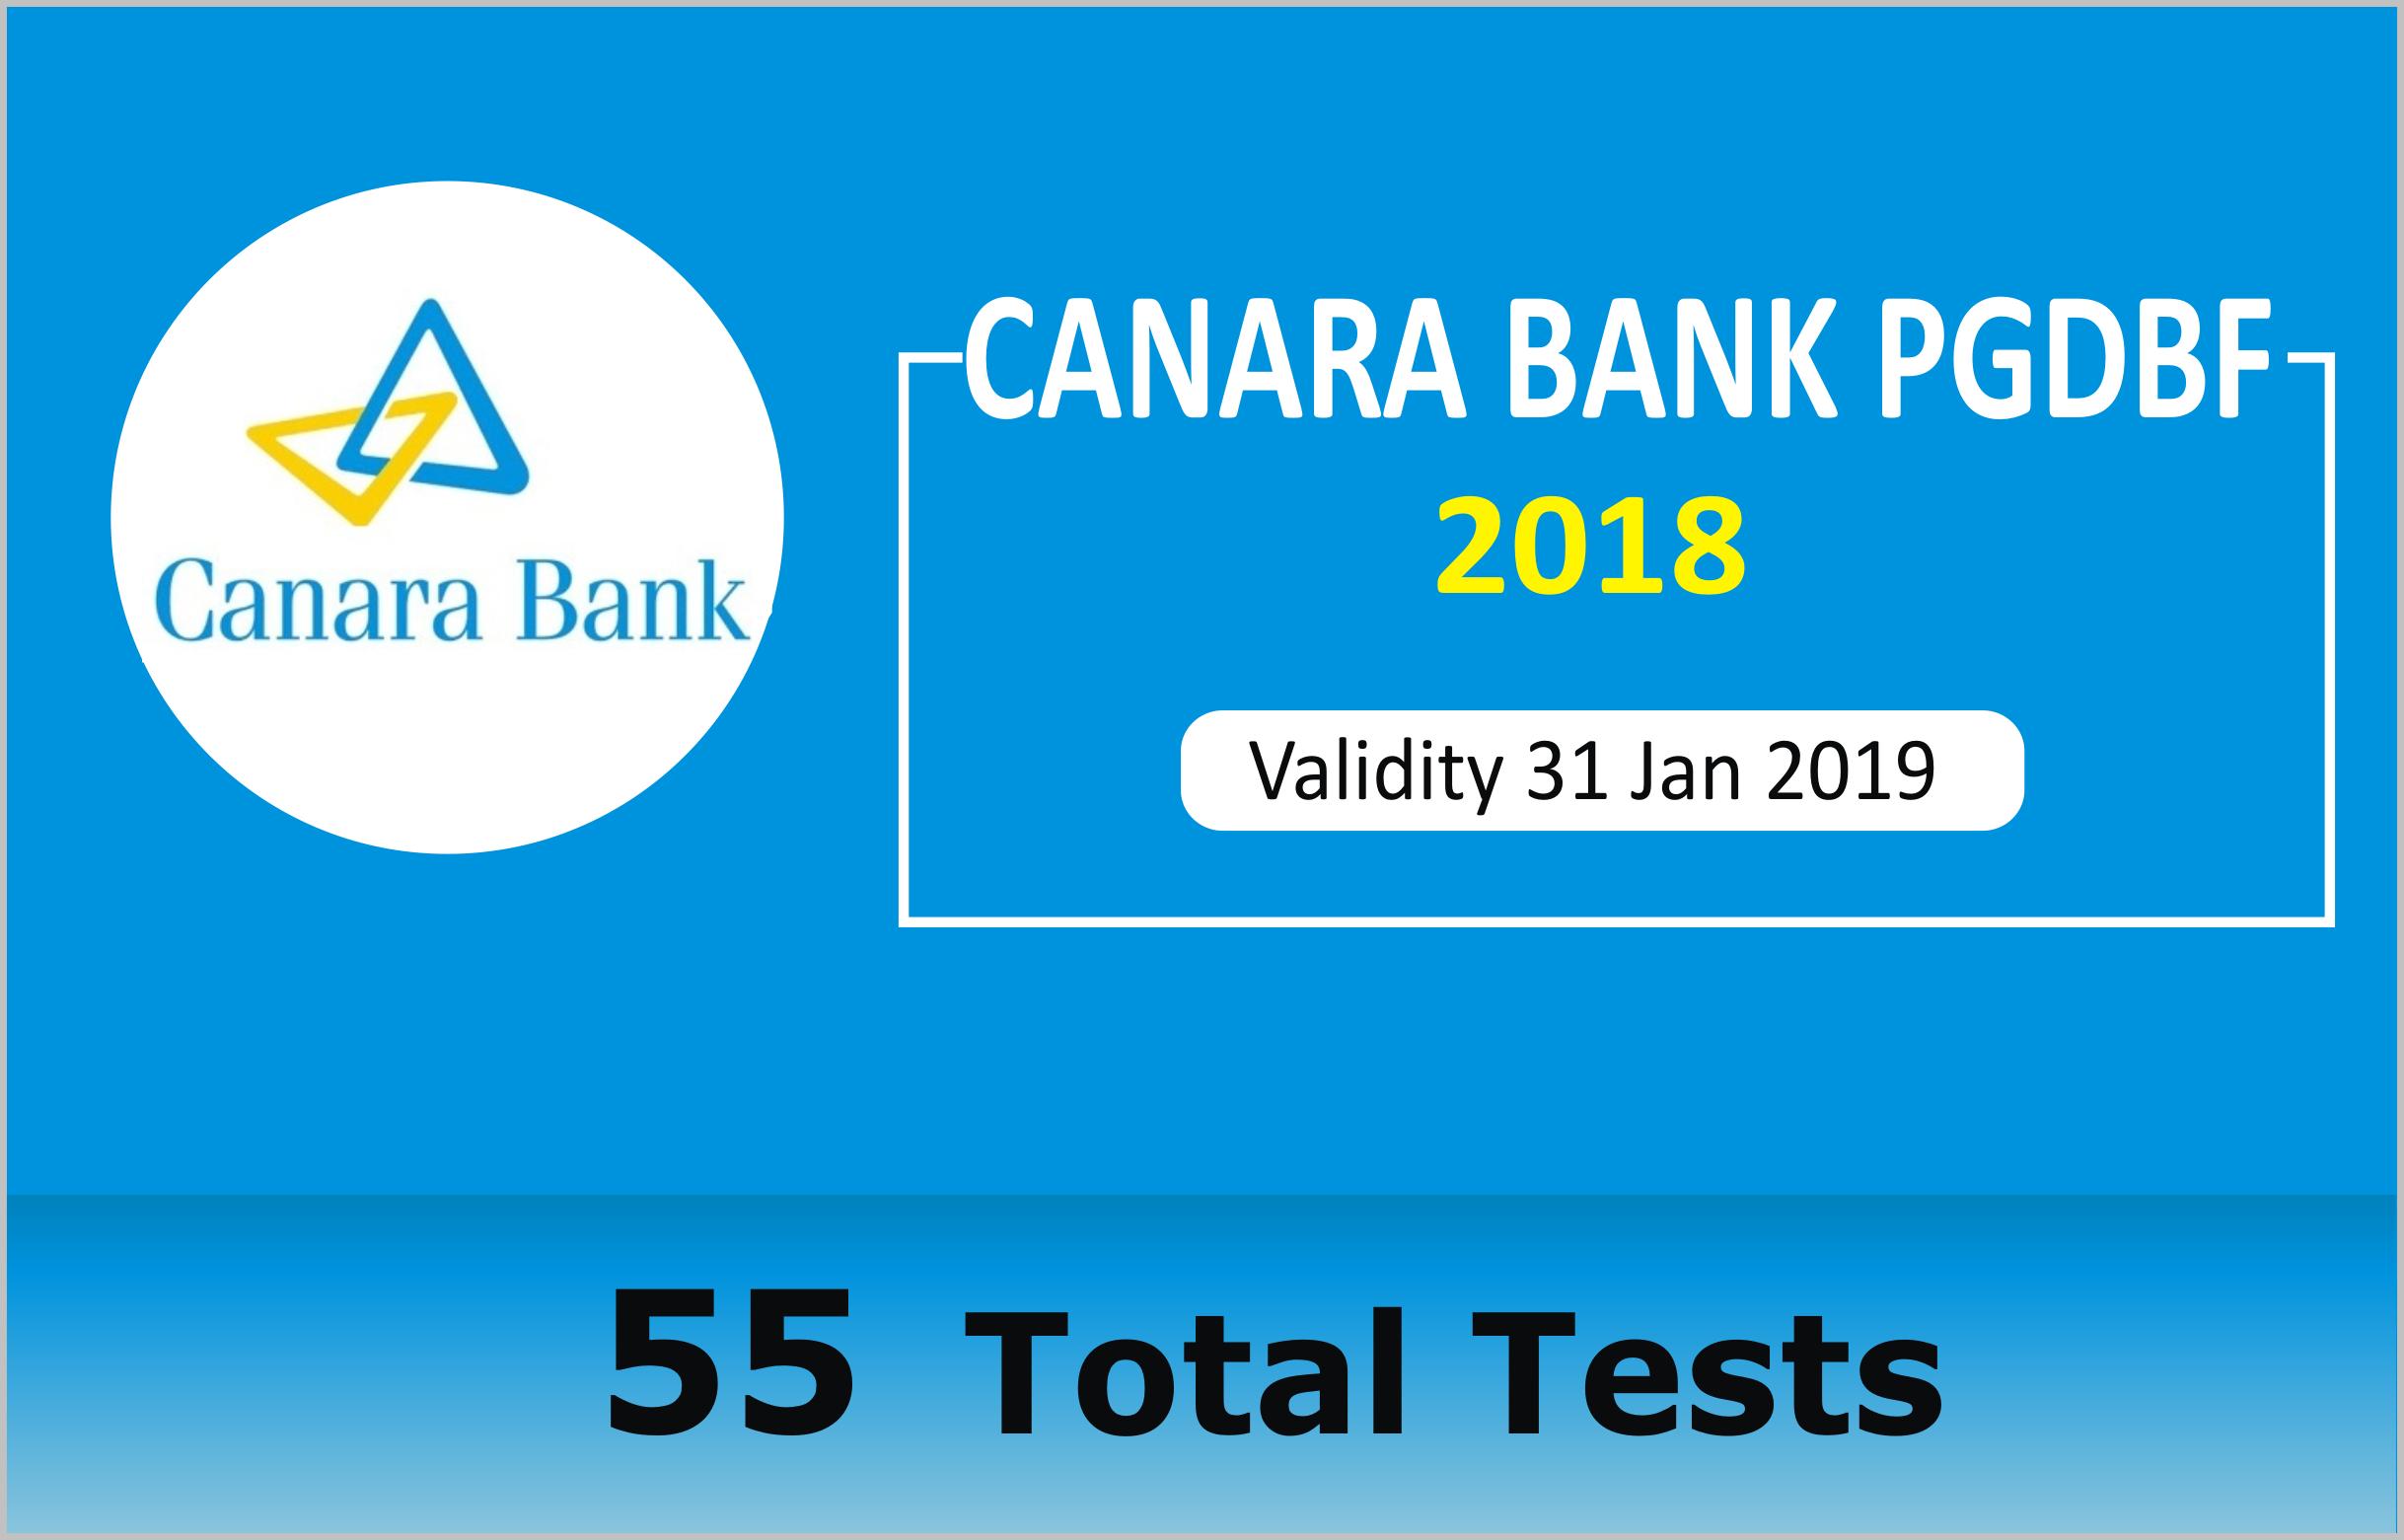 CANARA BANK PGDBF 2018